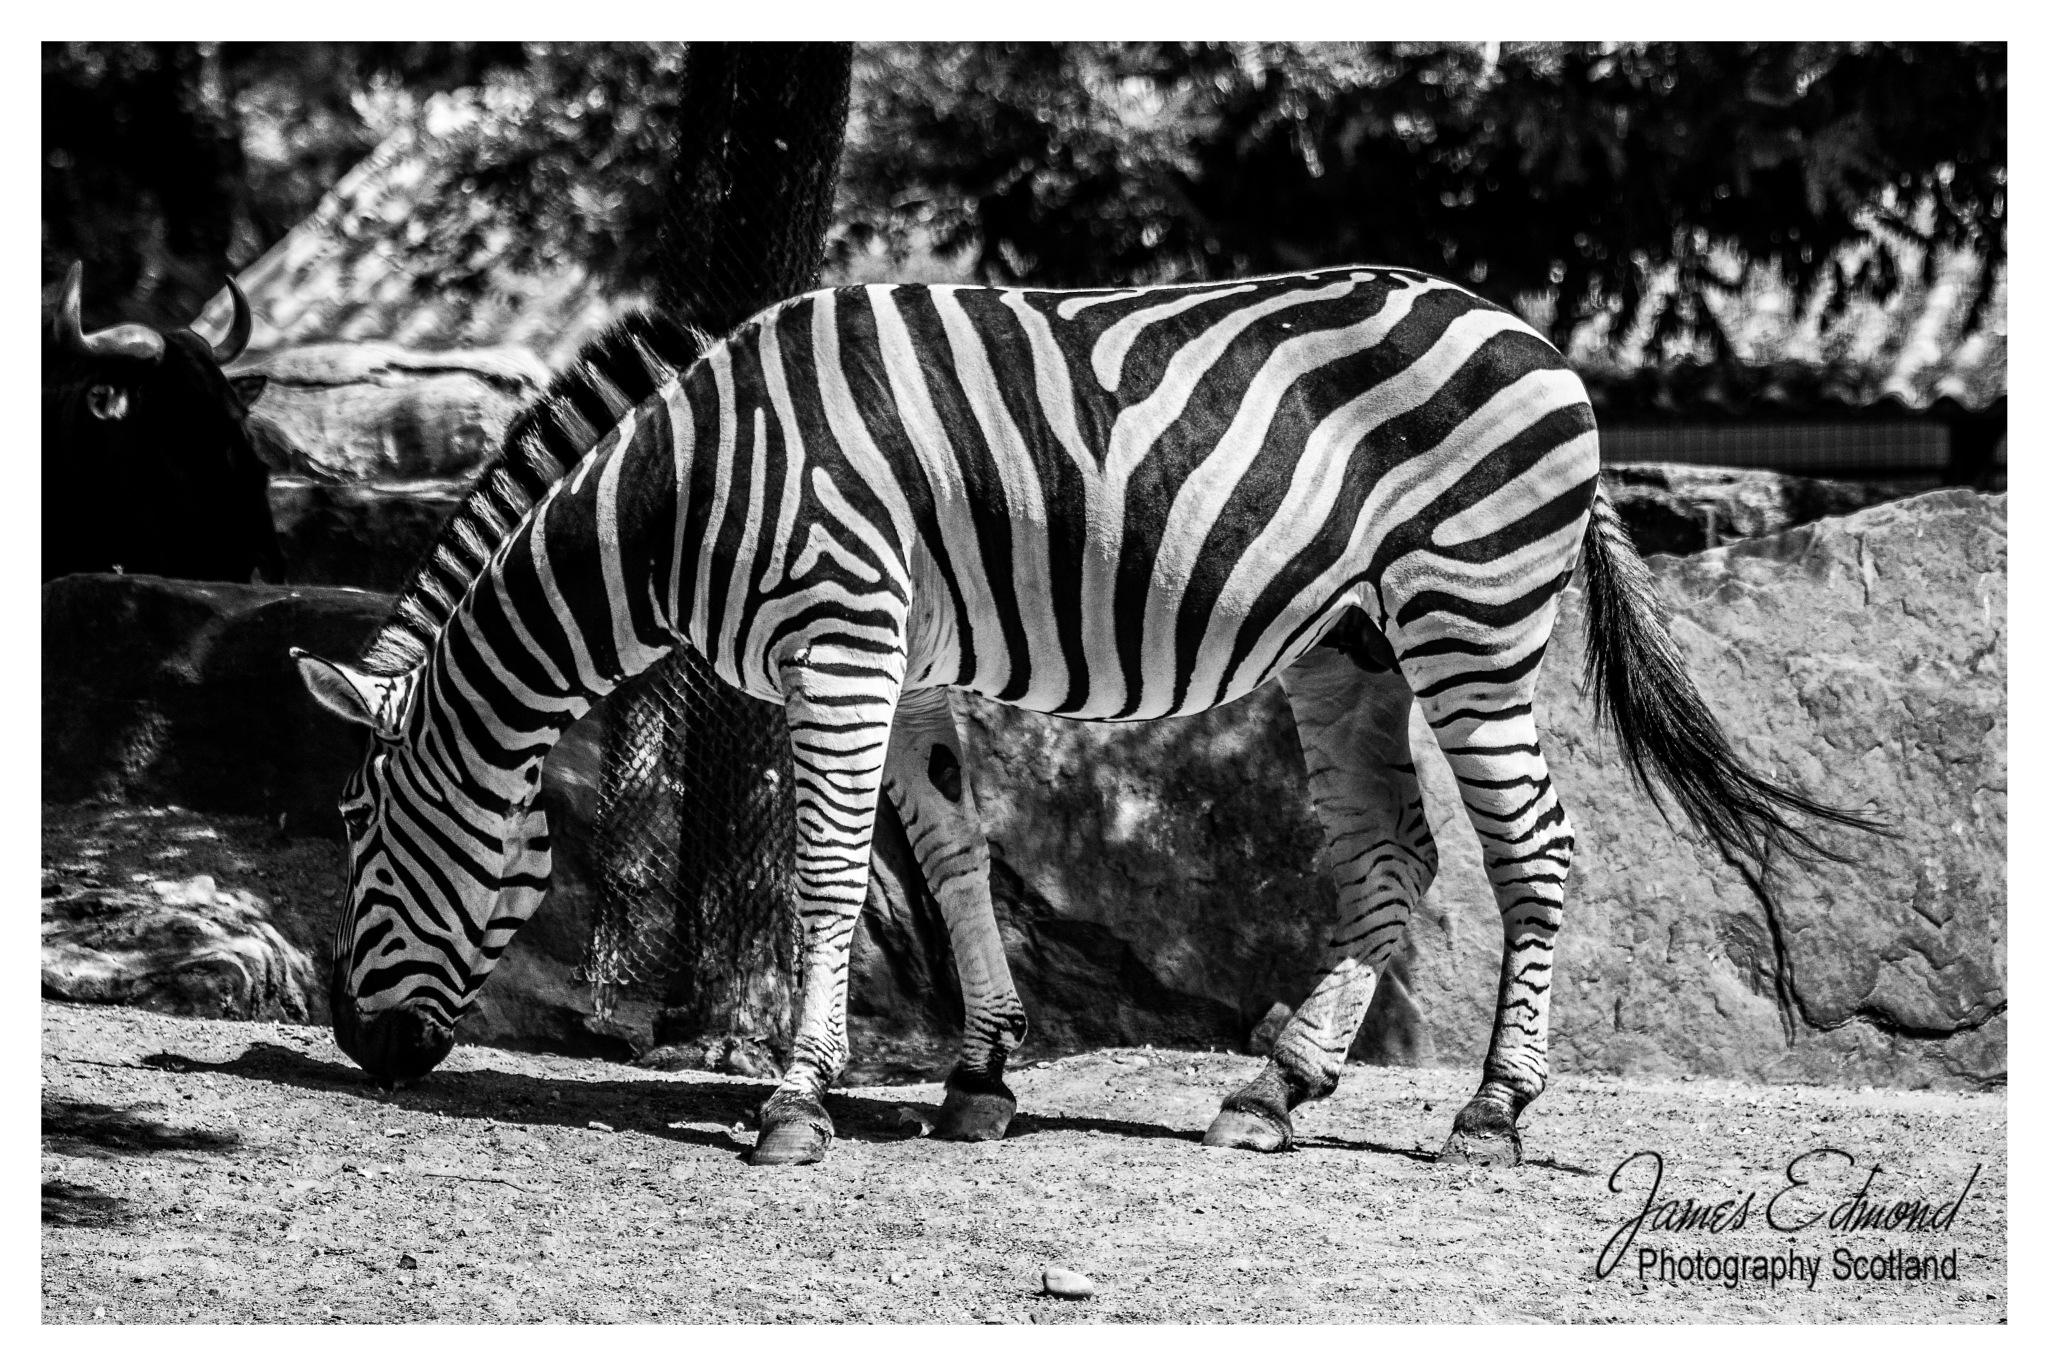 monochrome picture of a Zebra by James Edmond Photography